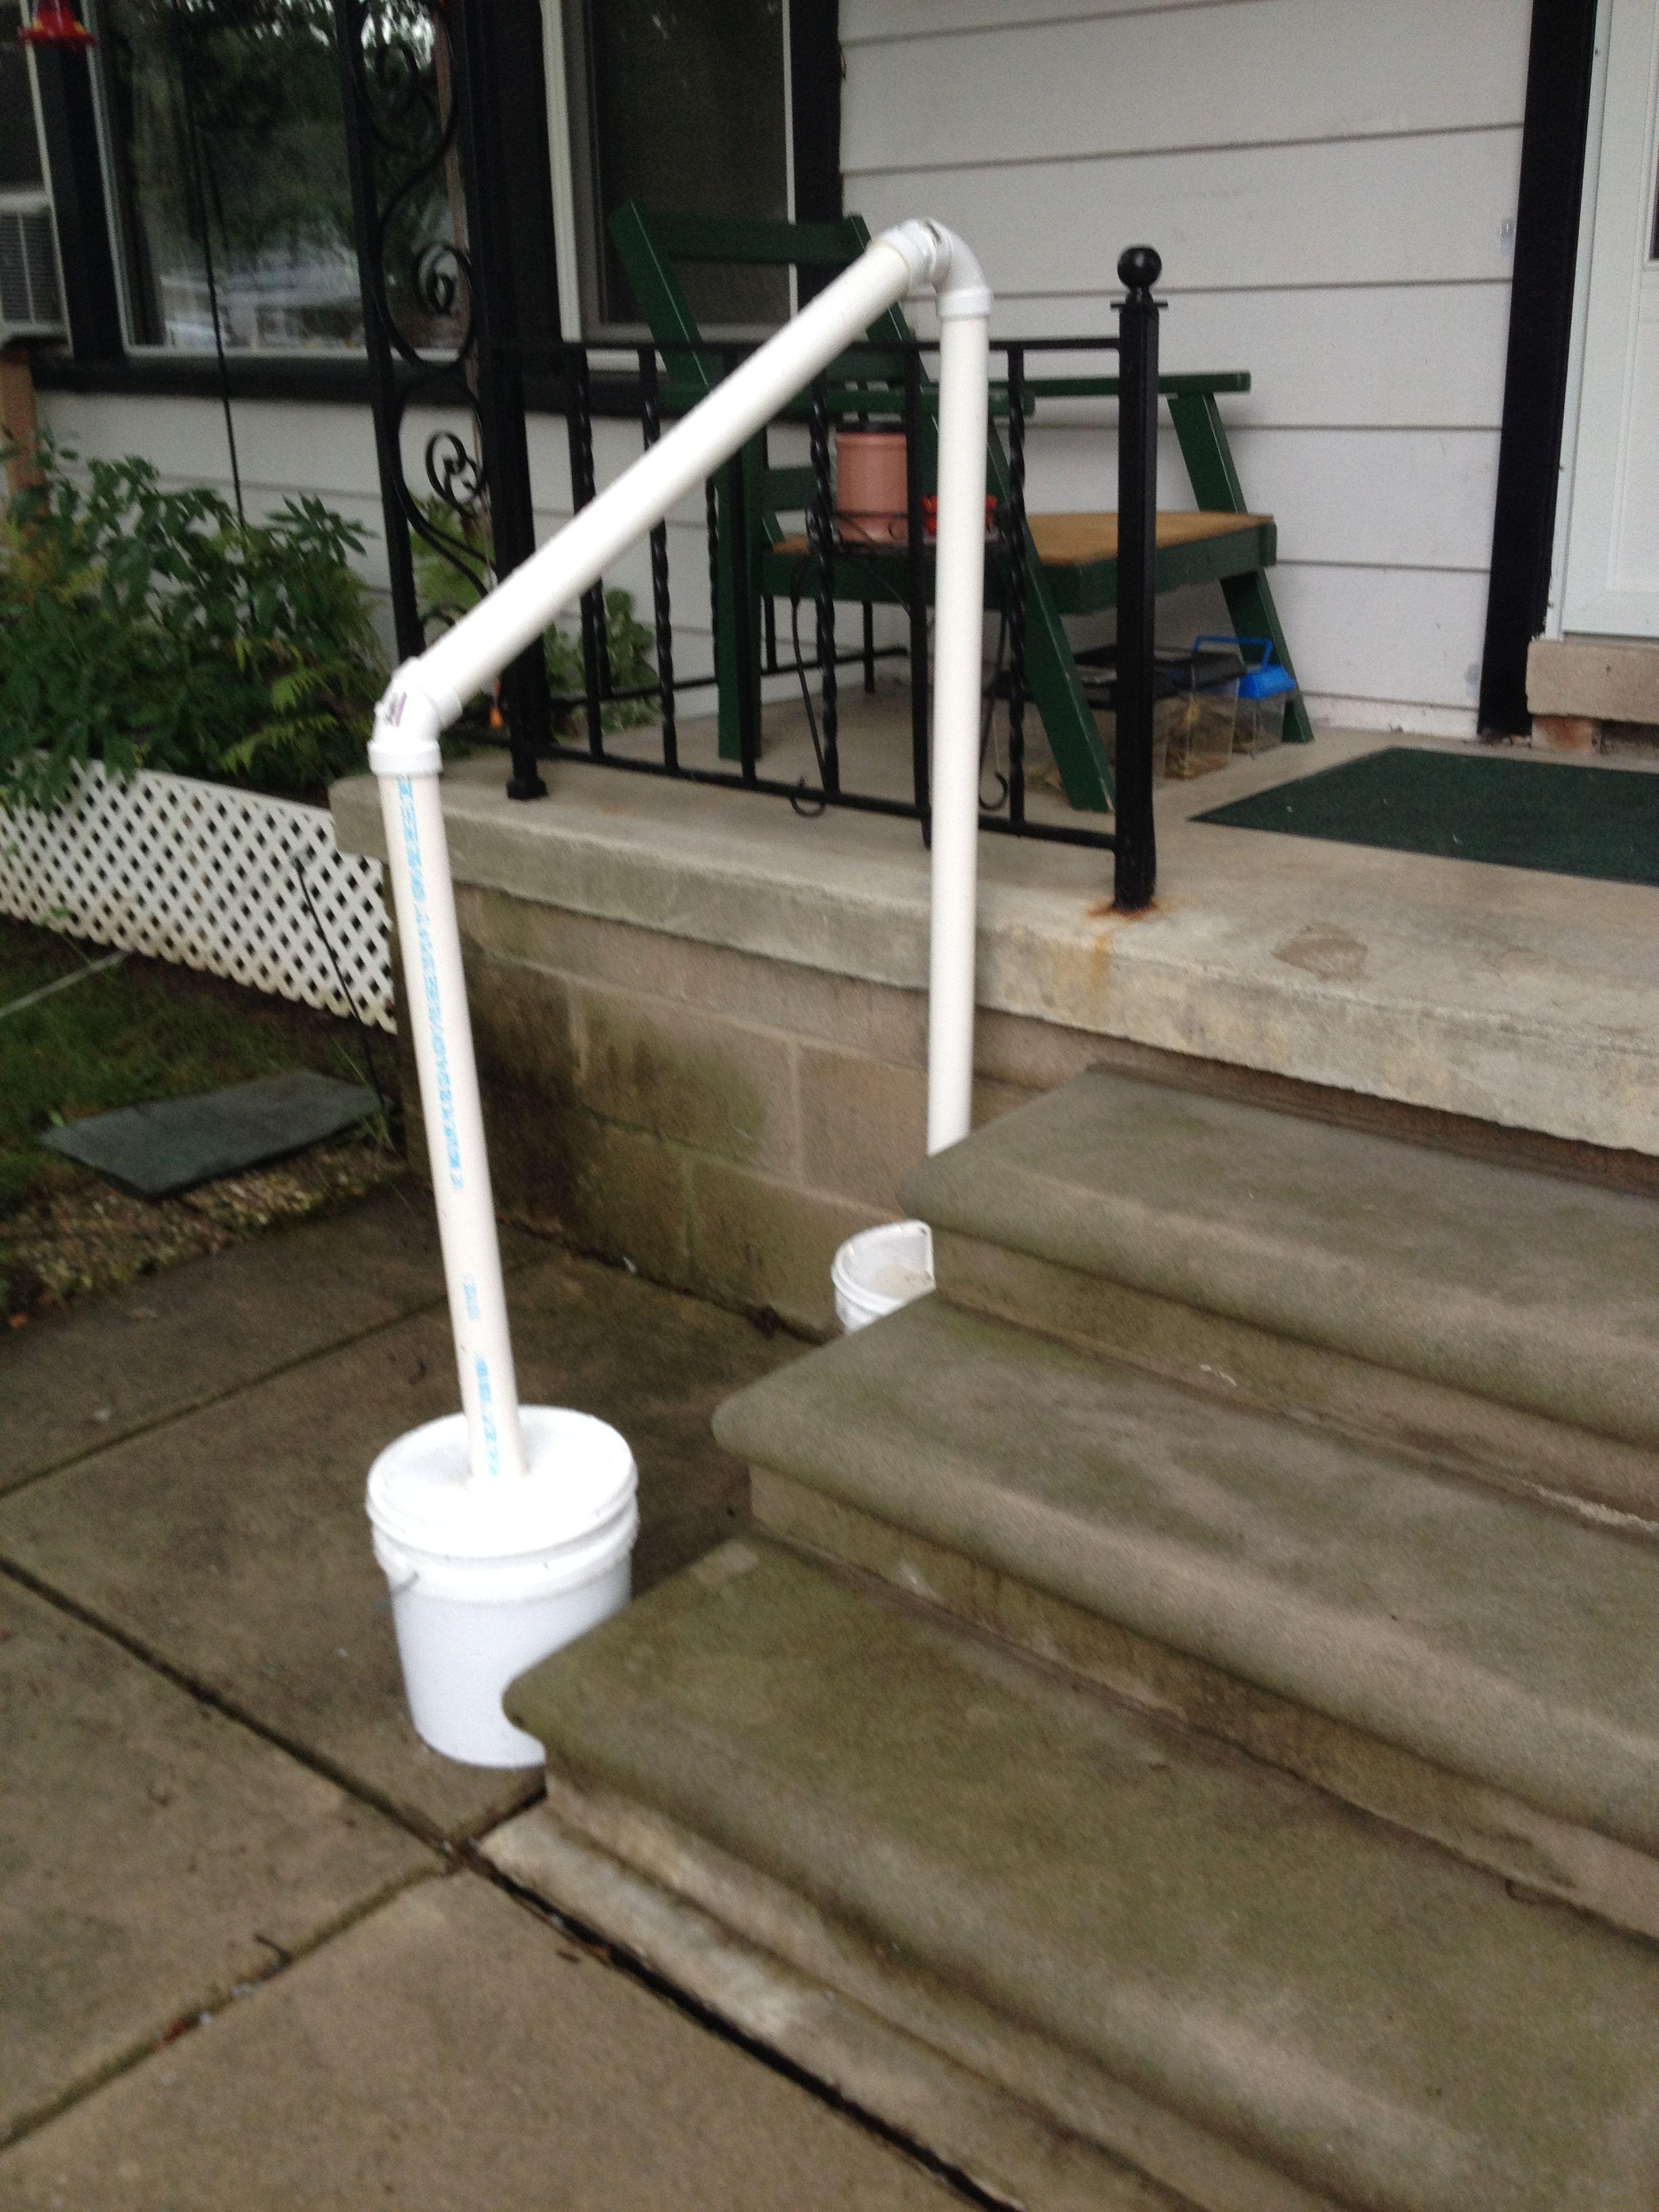 Temporary Hand Rail For My Mom When In Town Pvc Railing | Pvc Railings For Steps | 3 Step | Plastic | Corner Interior Stair | Steel Vertical Balustrade White Handrail Post | Design